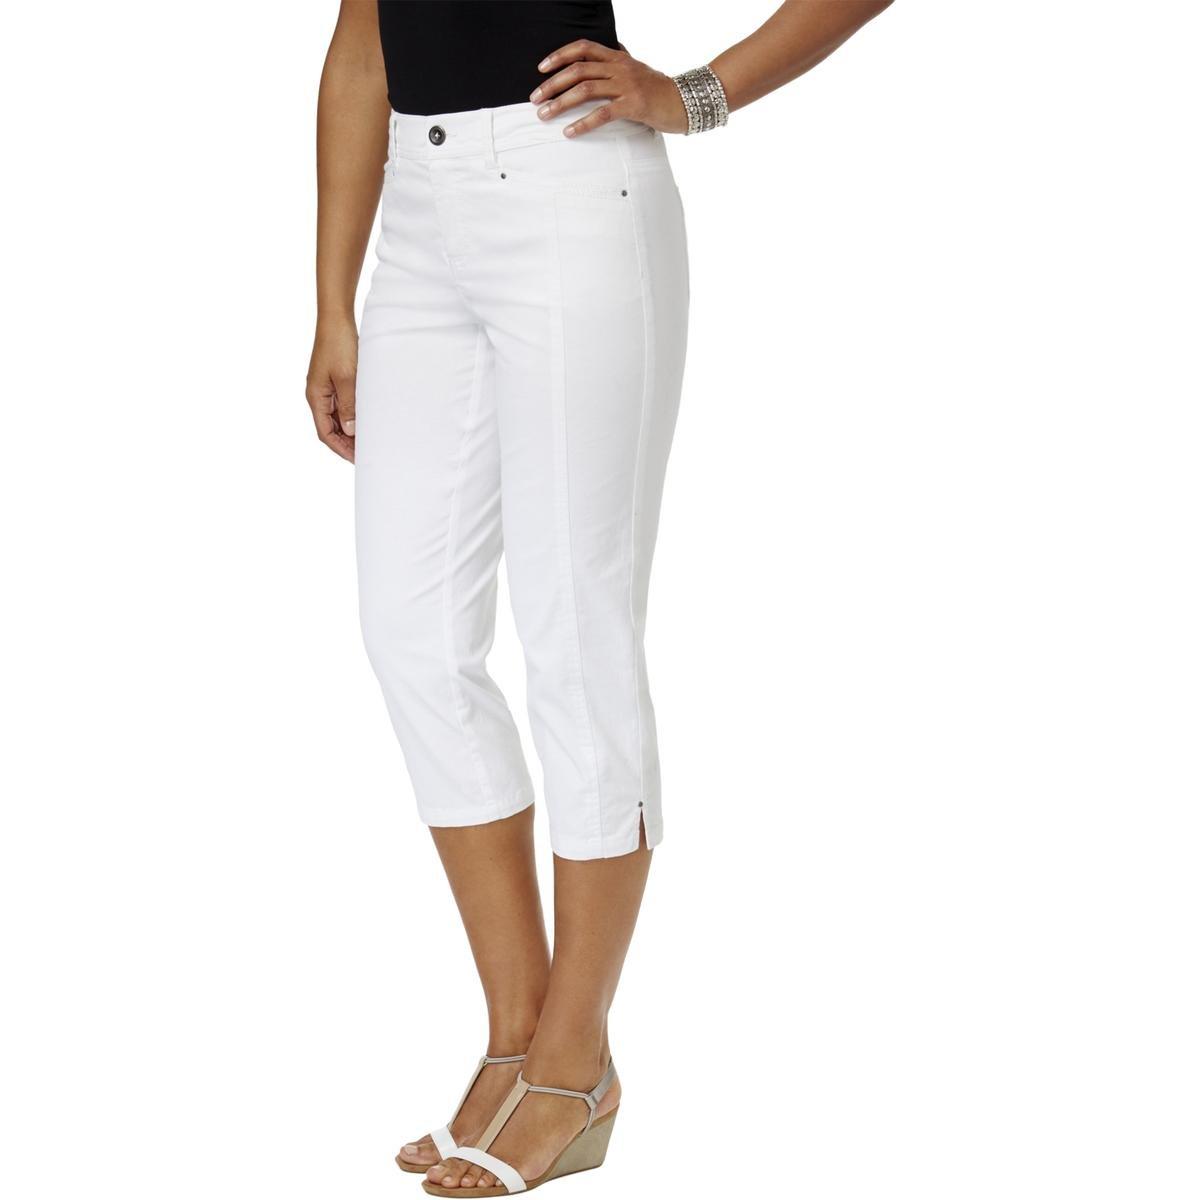 Style & Co.. Womens Petites Mid-Rise Tummy Control Capri Pants White 4P